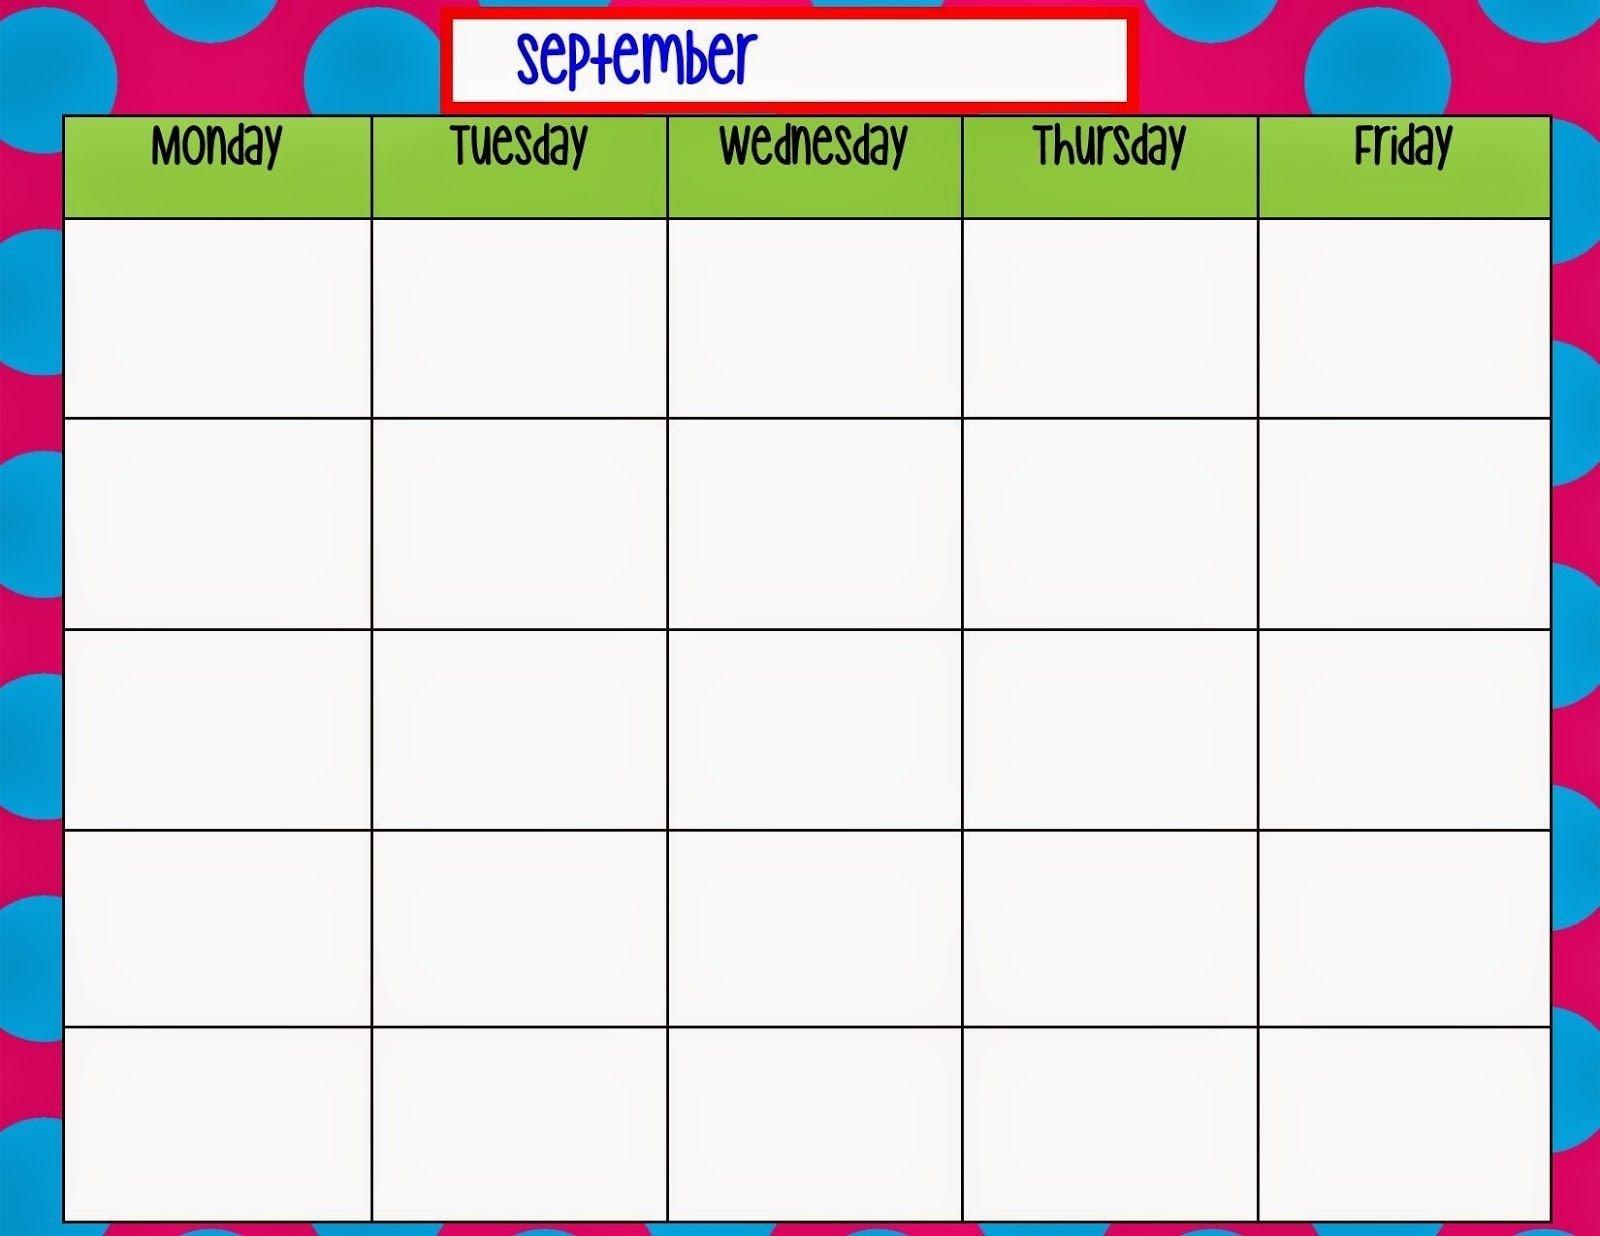 Monday To Friday Blank Calendar Template - Template Monday To Friday Calender Template